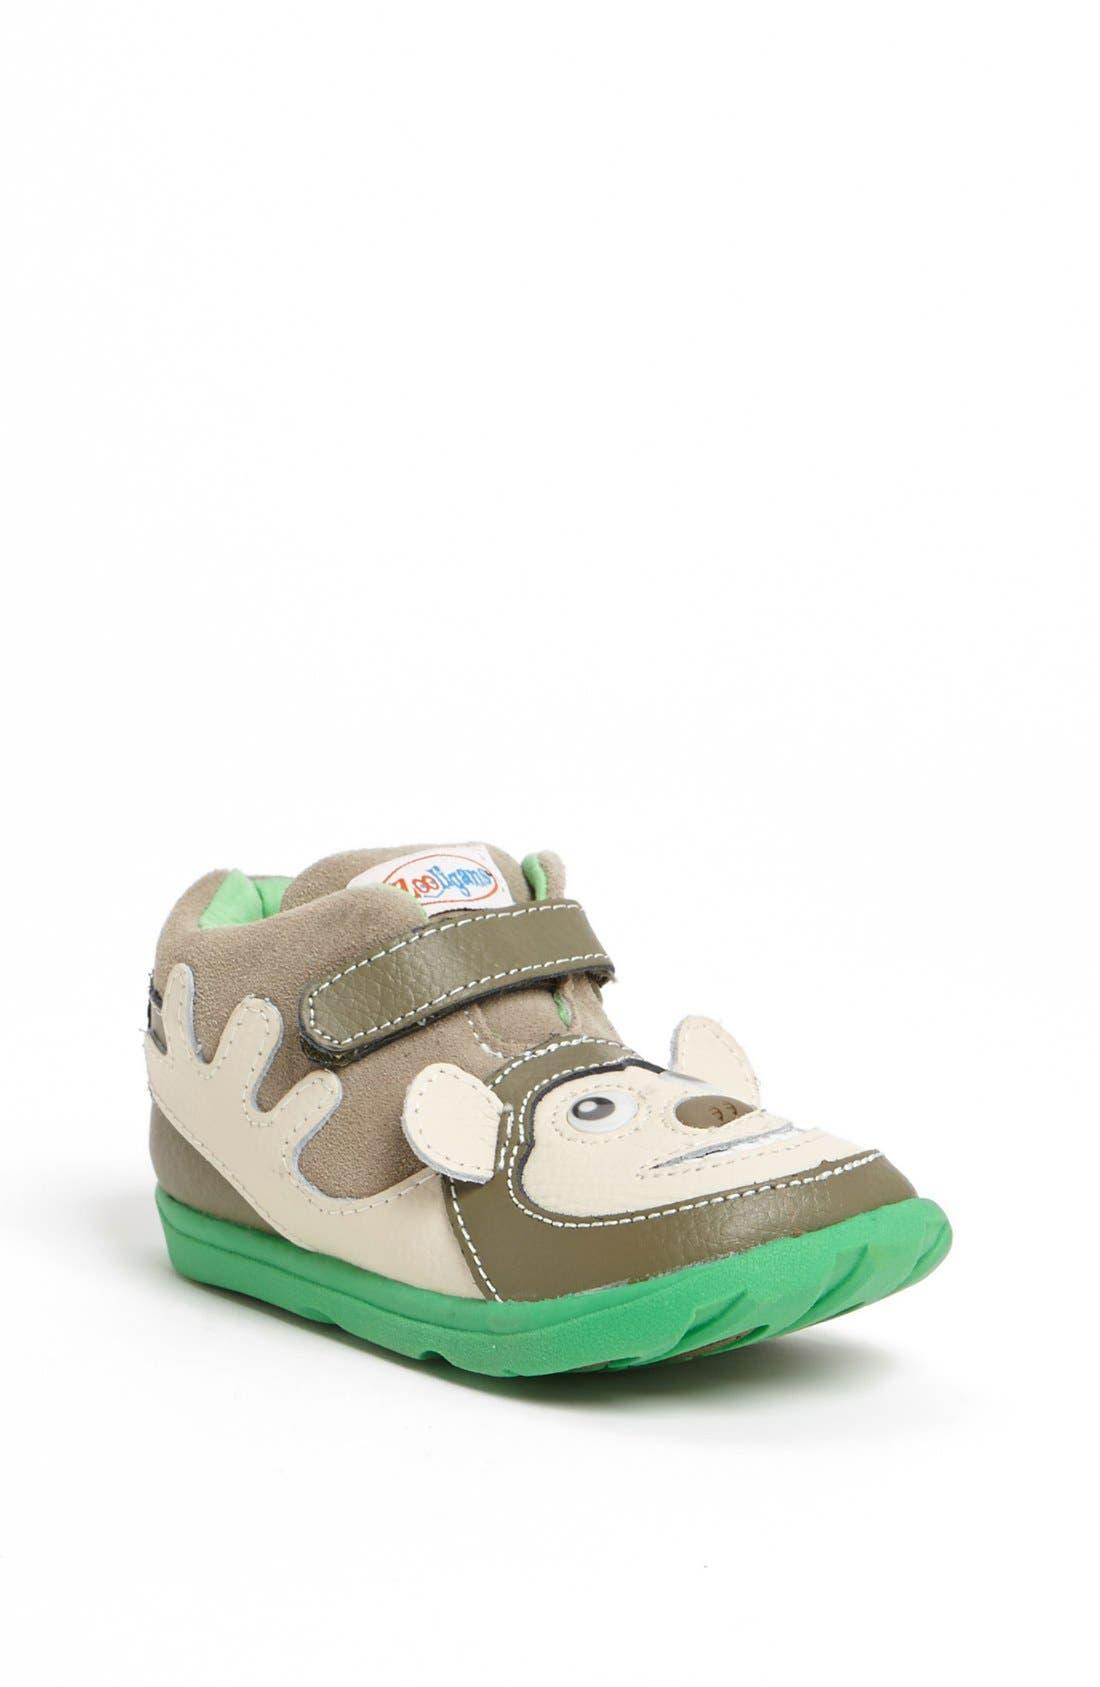 Main Image - Zooligans™ 'Bobo the Monkey' Sneaker (Baby, Walker, Toddler & Little Kid)